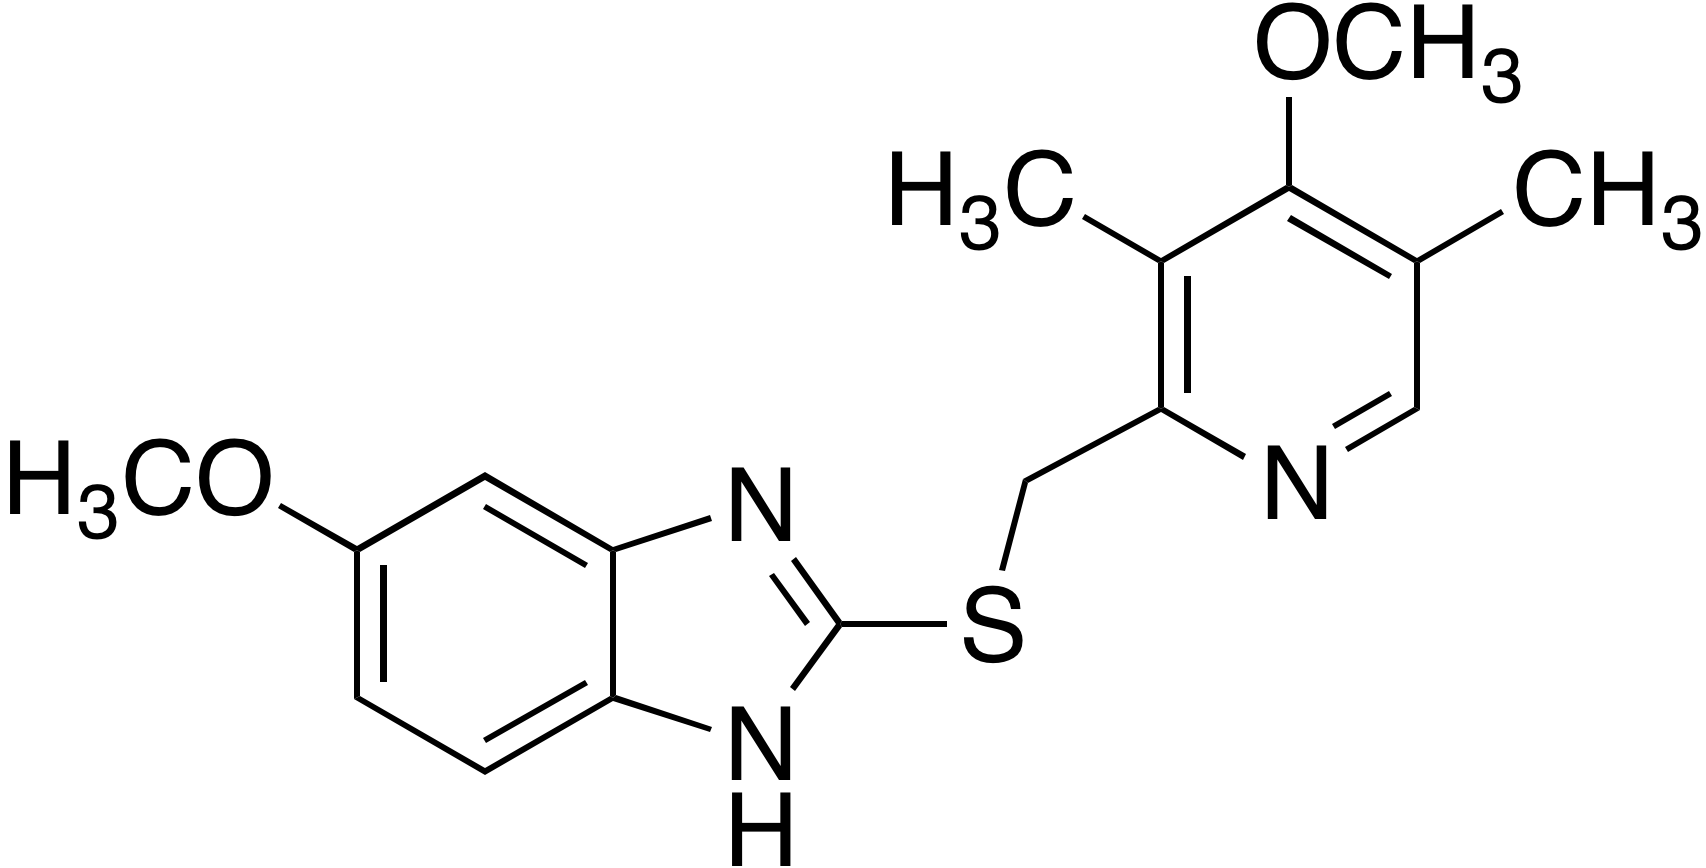 5-Methoxy-2-(((4-methoxy-3,5-dimethylpyridin-2-yl)methyl)thio)-1H-imidazo[4,5-b]pyridine